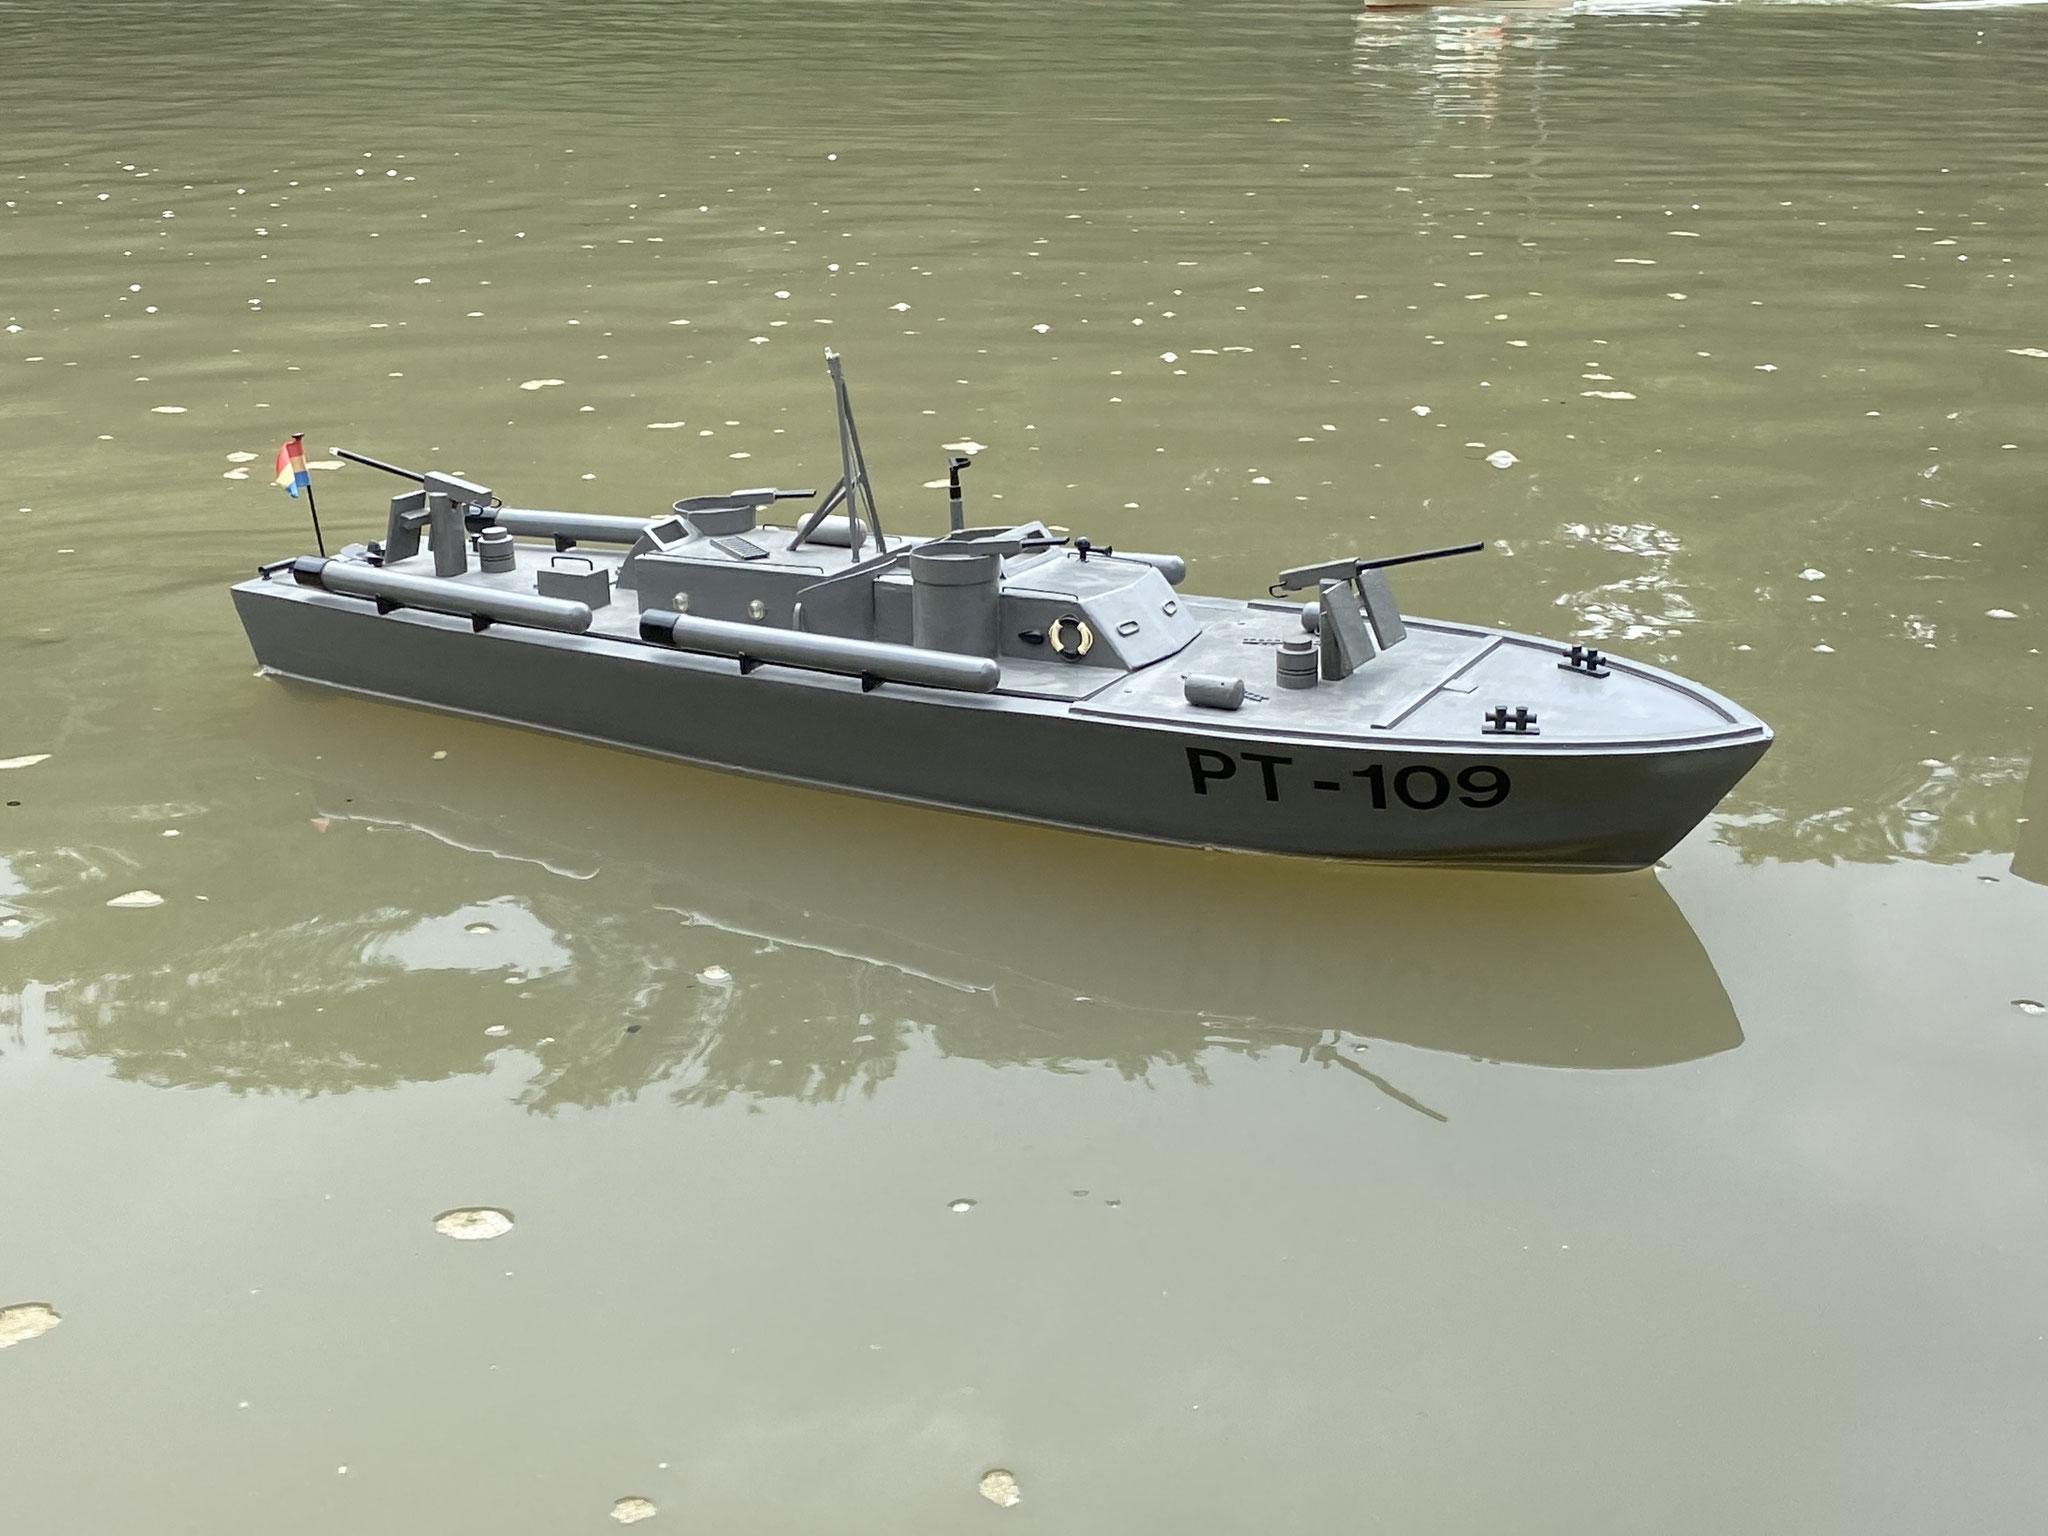 PT-109